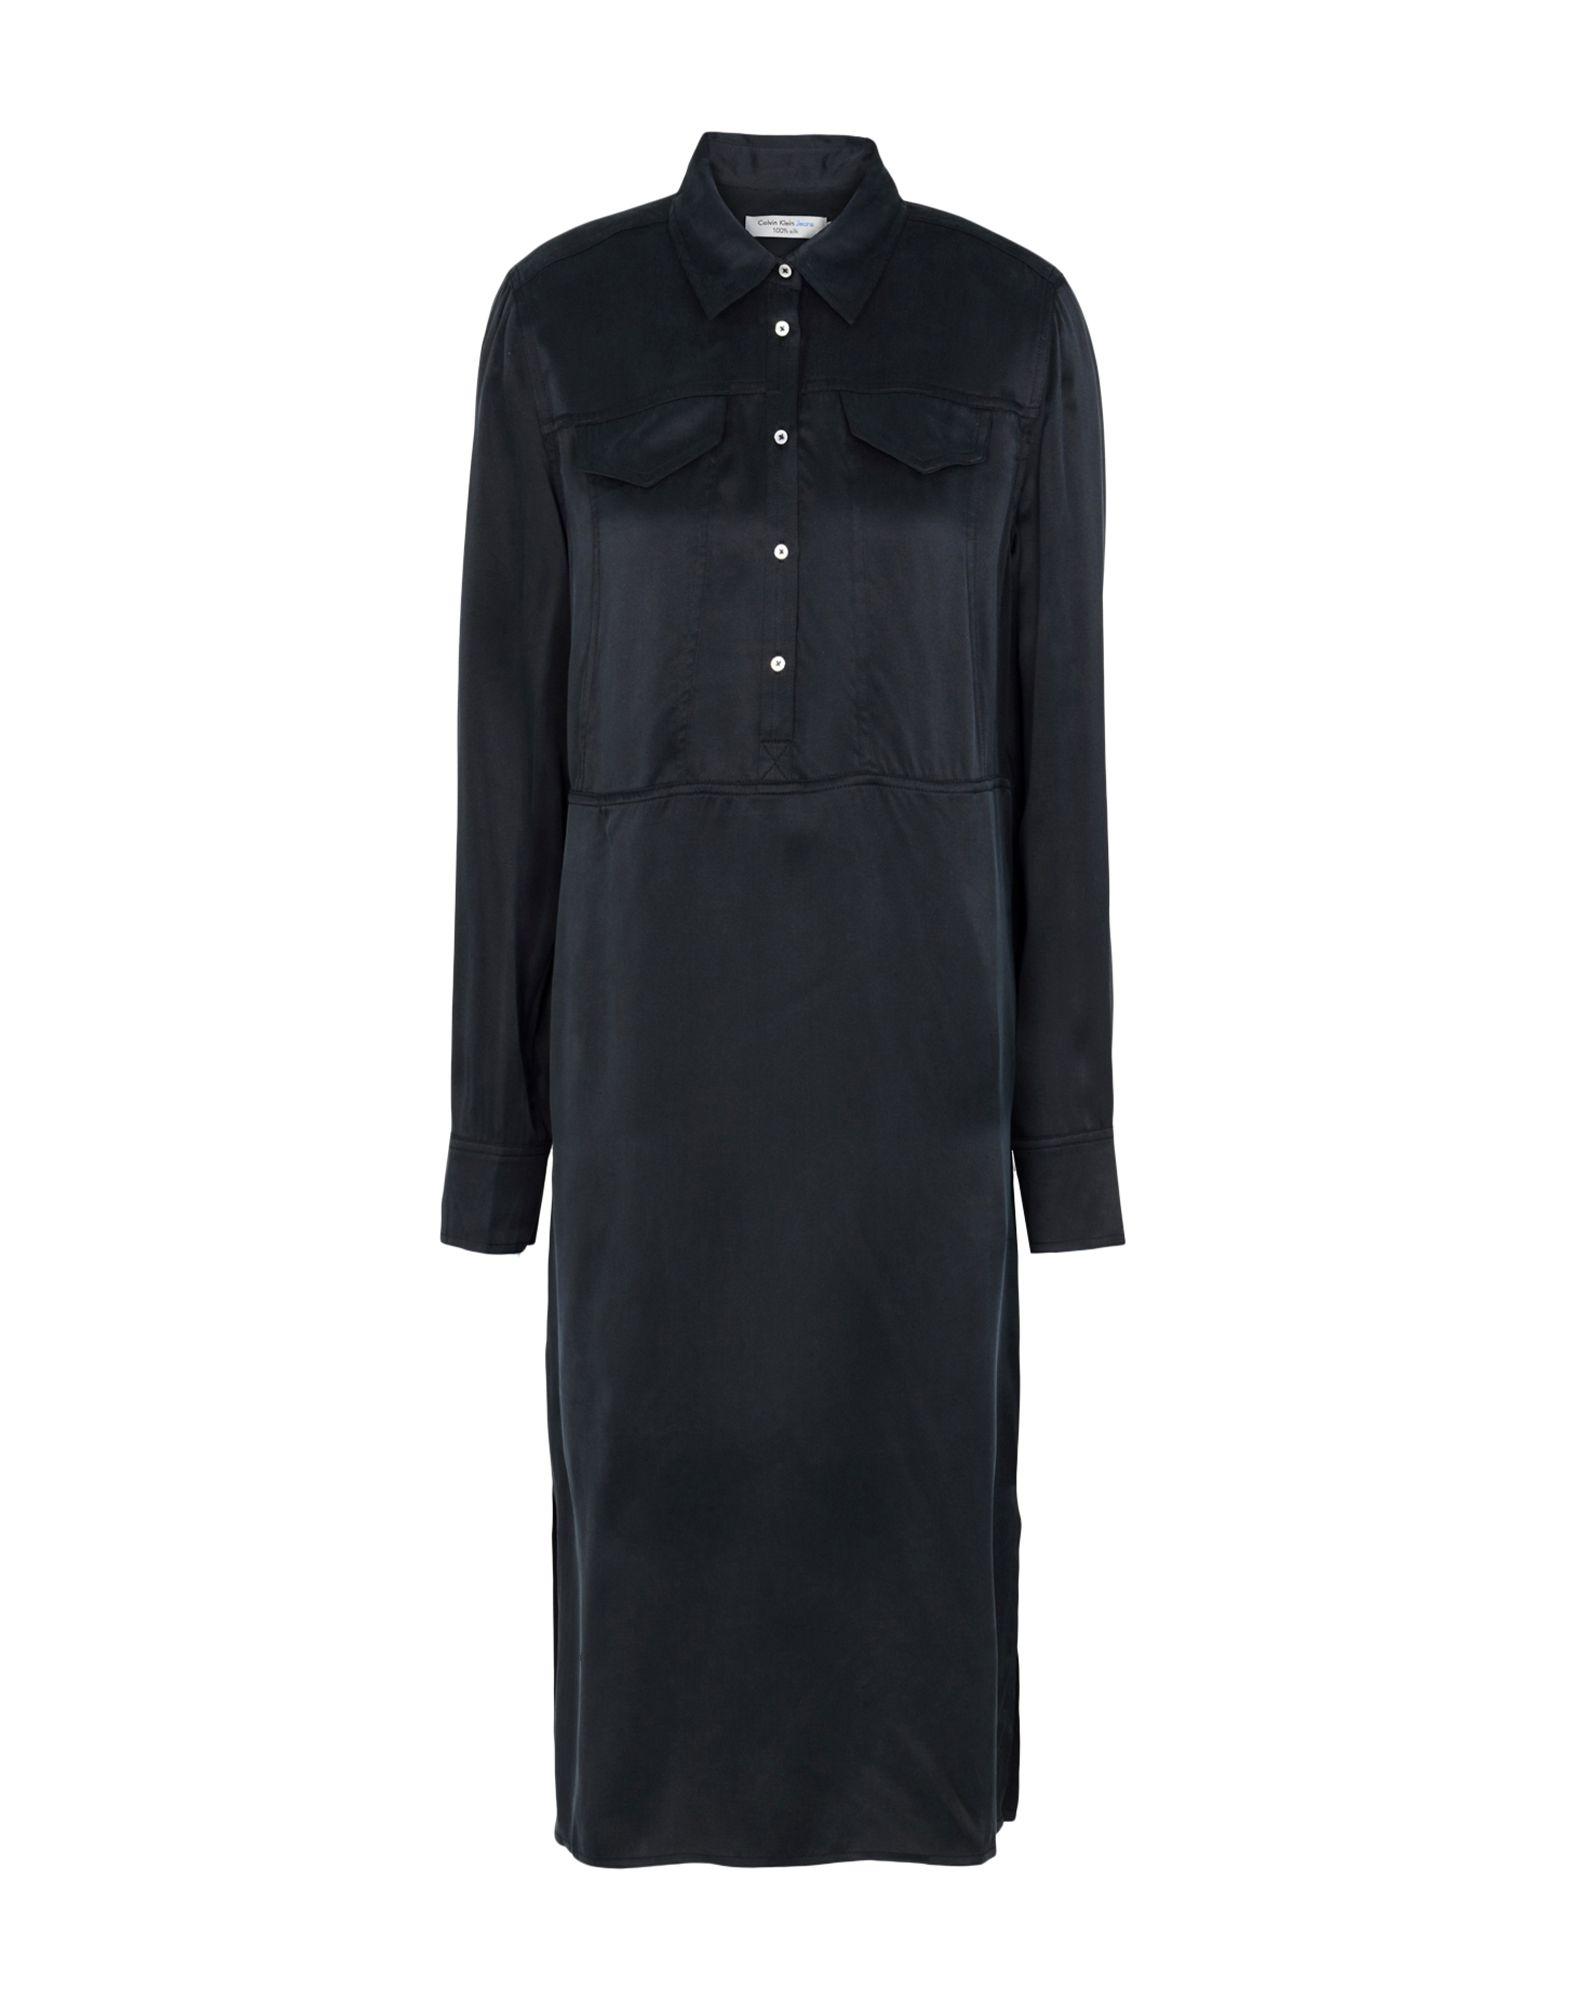 CALVIN KLEIN JEANS Платье до колена